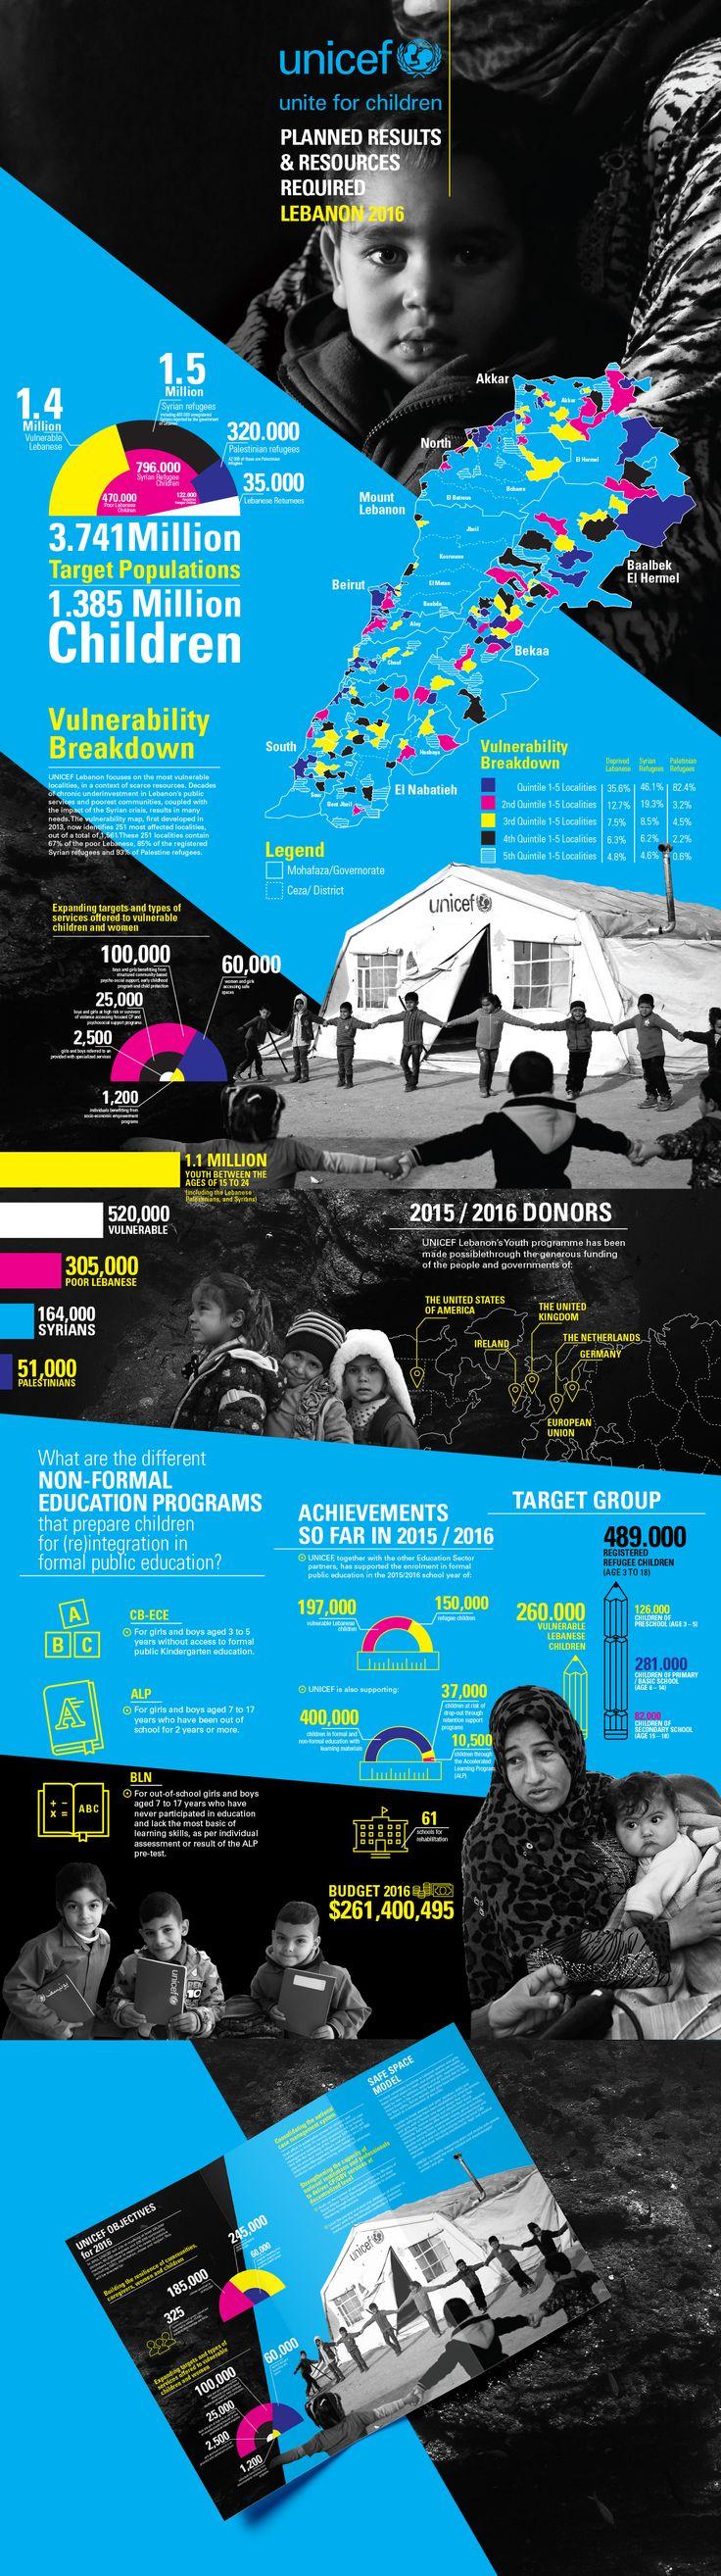 Brochure Design for UNICEF Lebanon collaborated with Vignette Interactive.